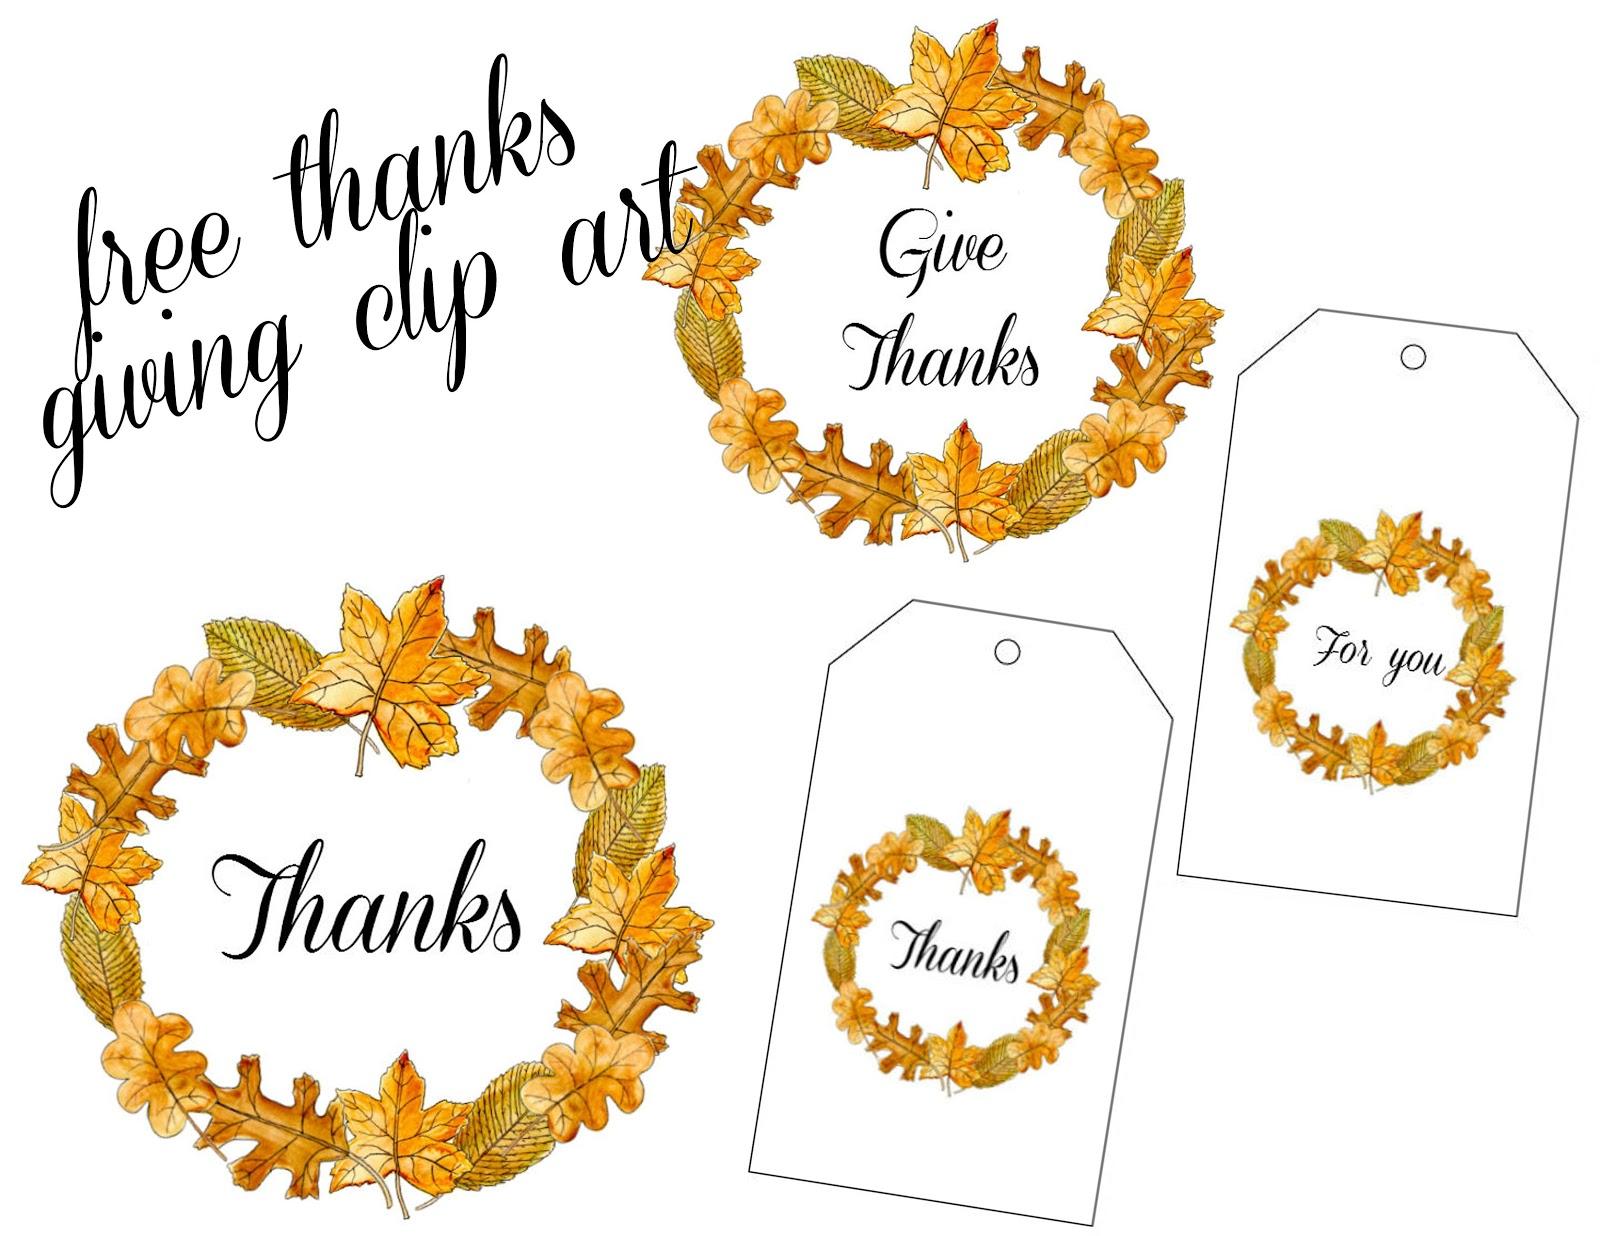 Free Printable Thanksgiving Clip Art free image.